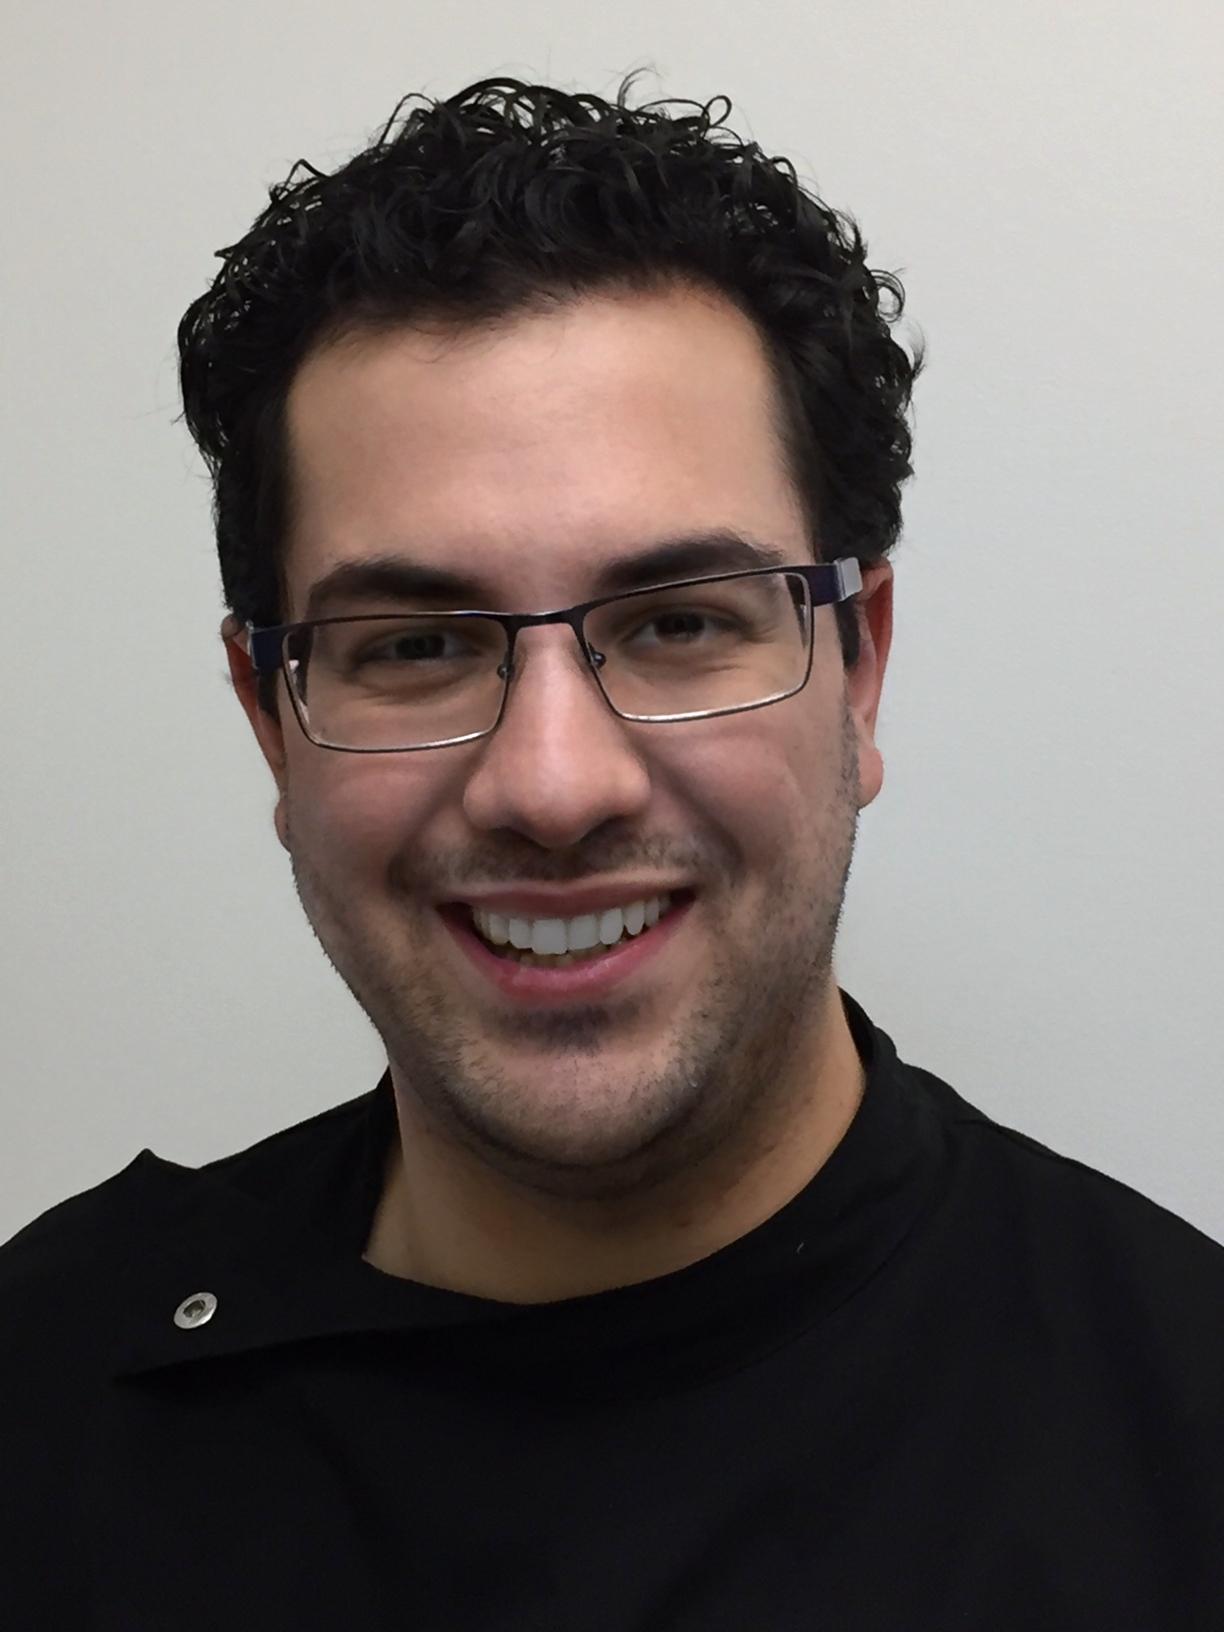 Dr Sam Adel